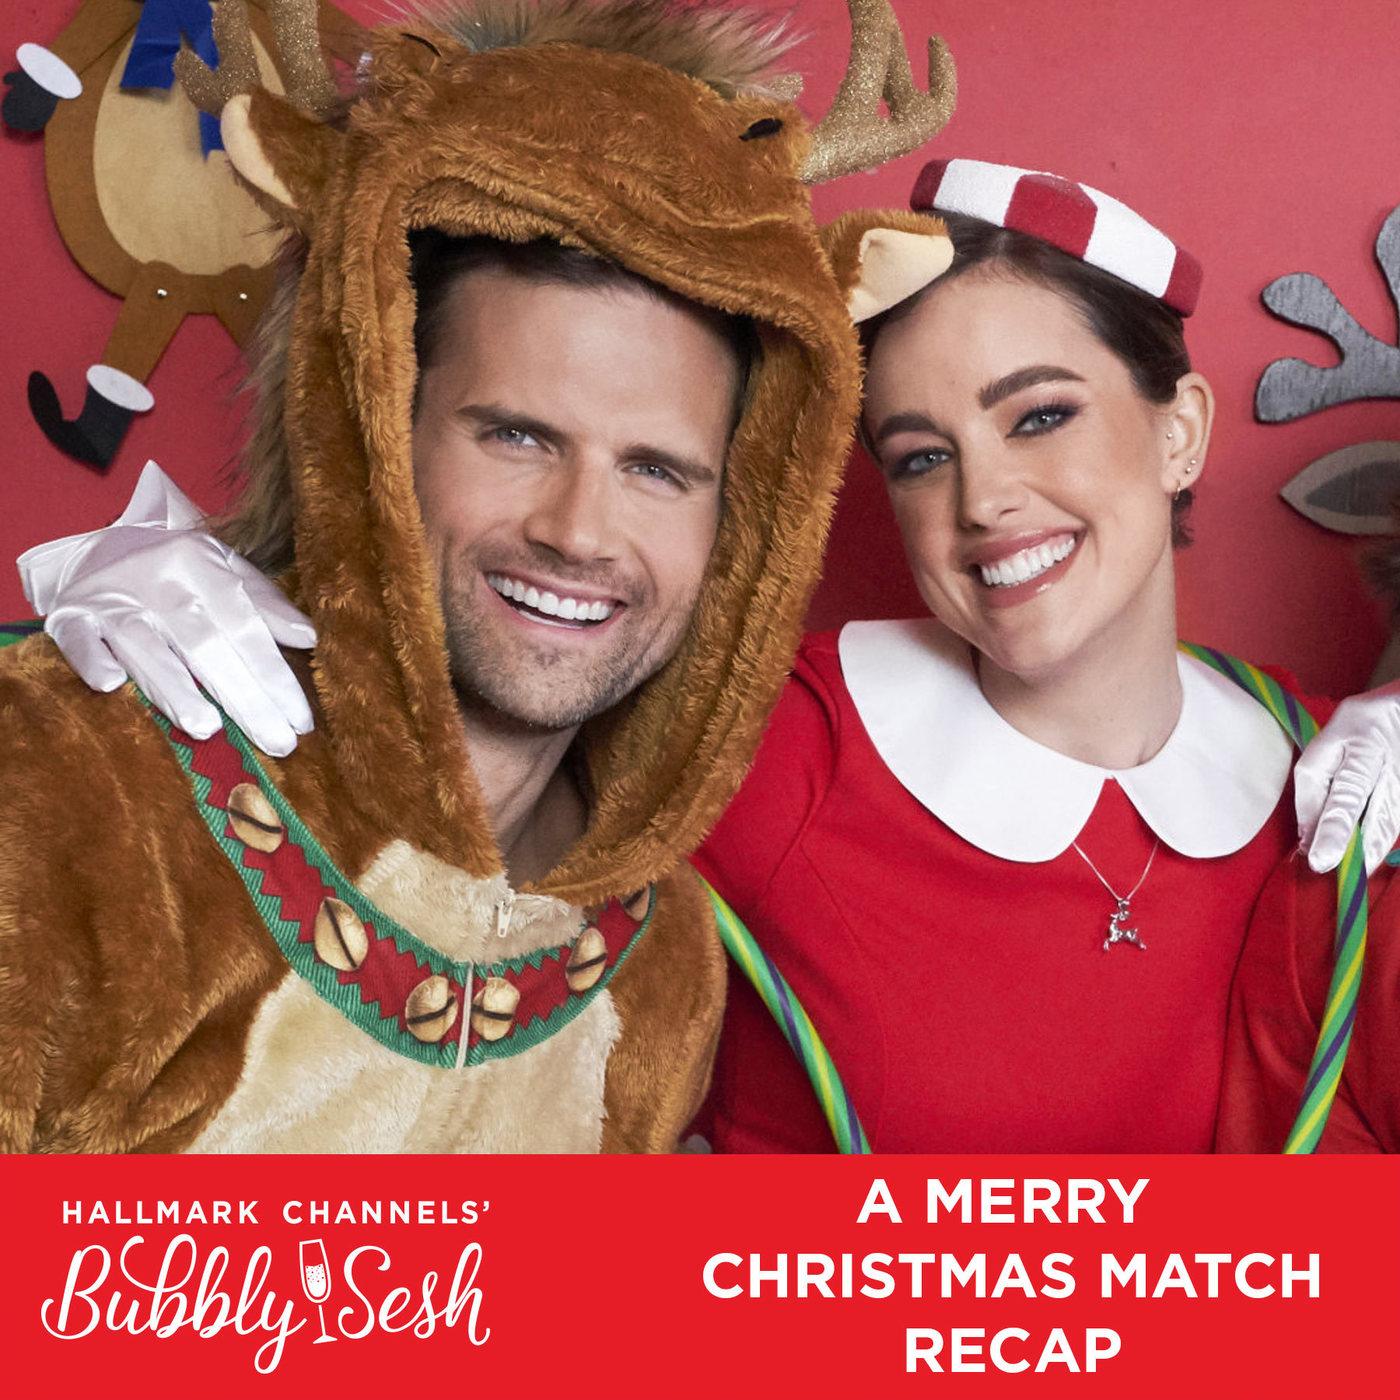 A Merry Christmas Match Recap